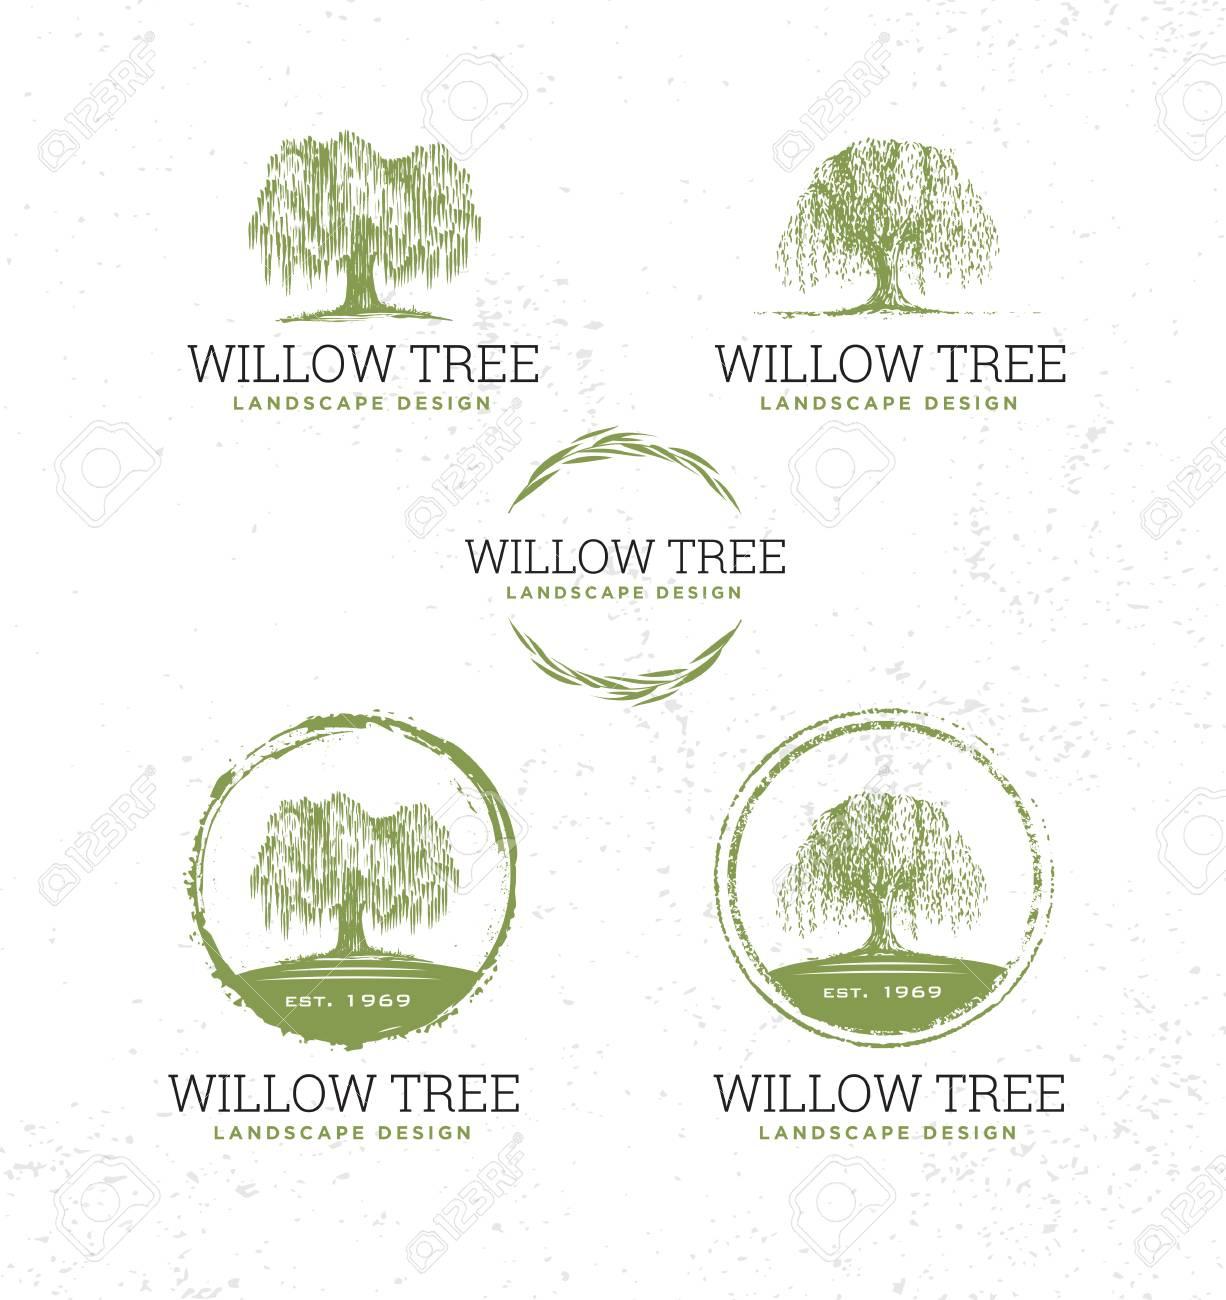 Willow Tree Landscape Design Creative Vector Nature Friendly